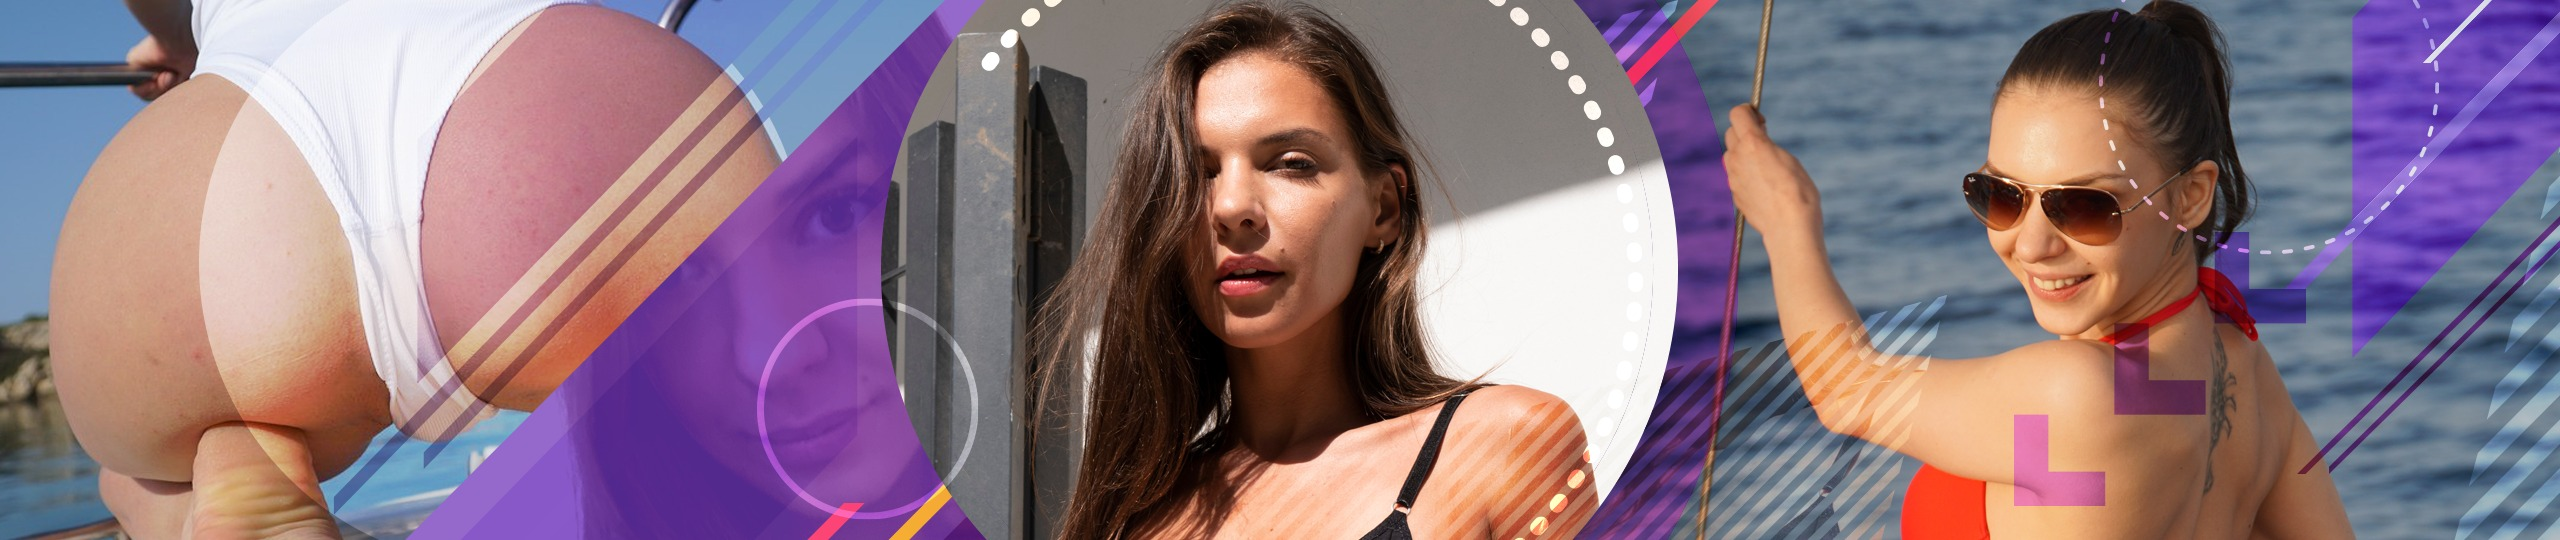 Alina Henessy - profile image